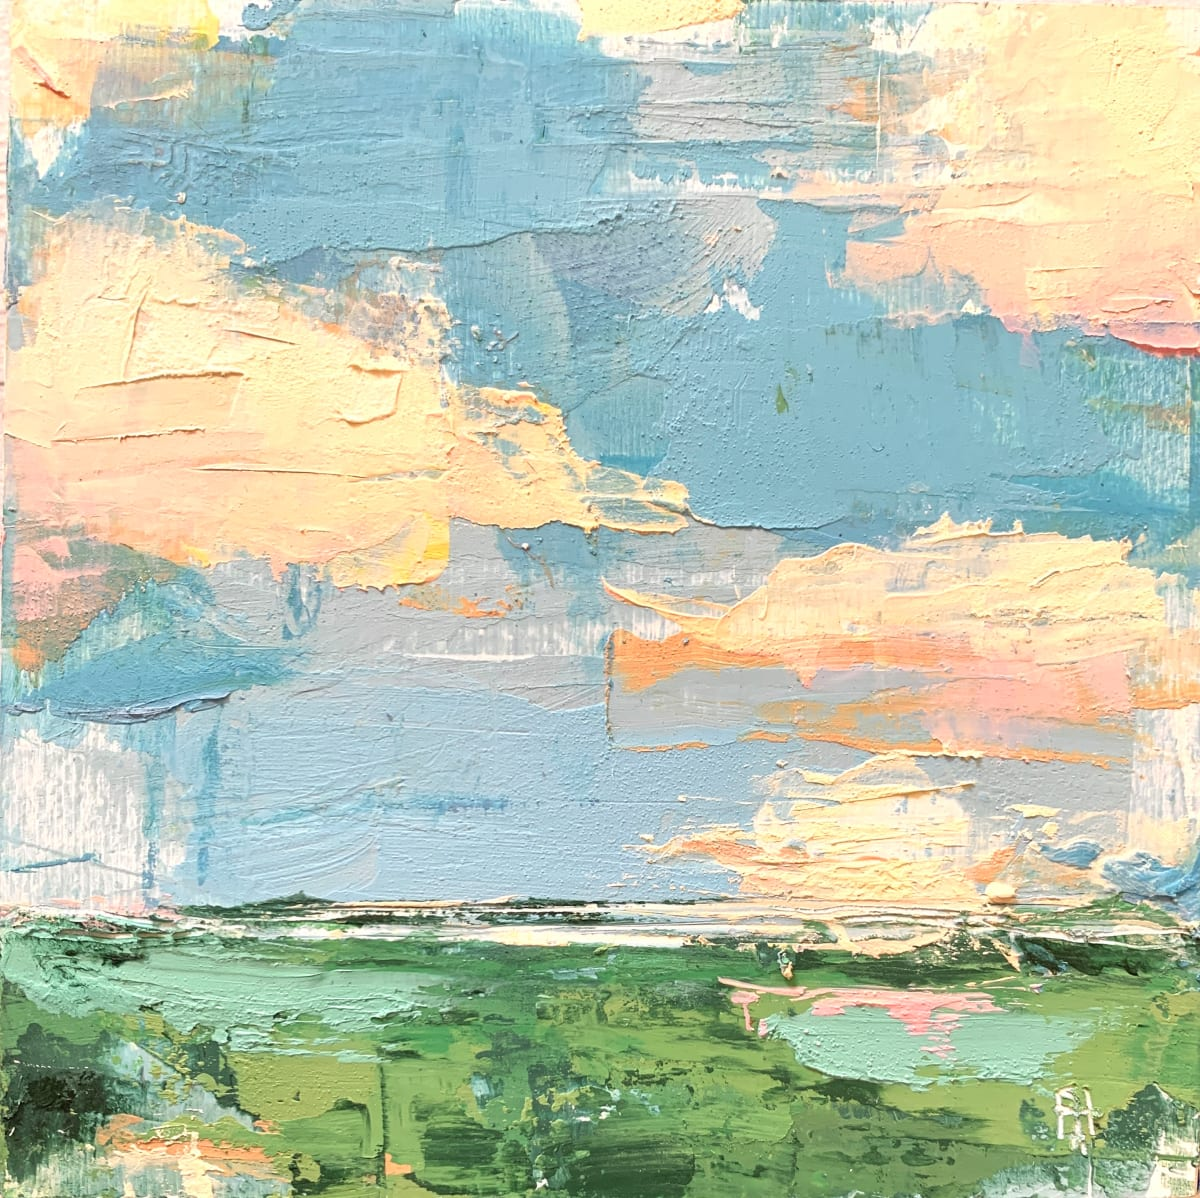 Little Landscape #11 by Sally Hootnick